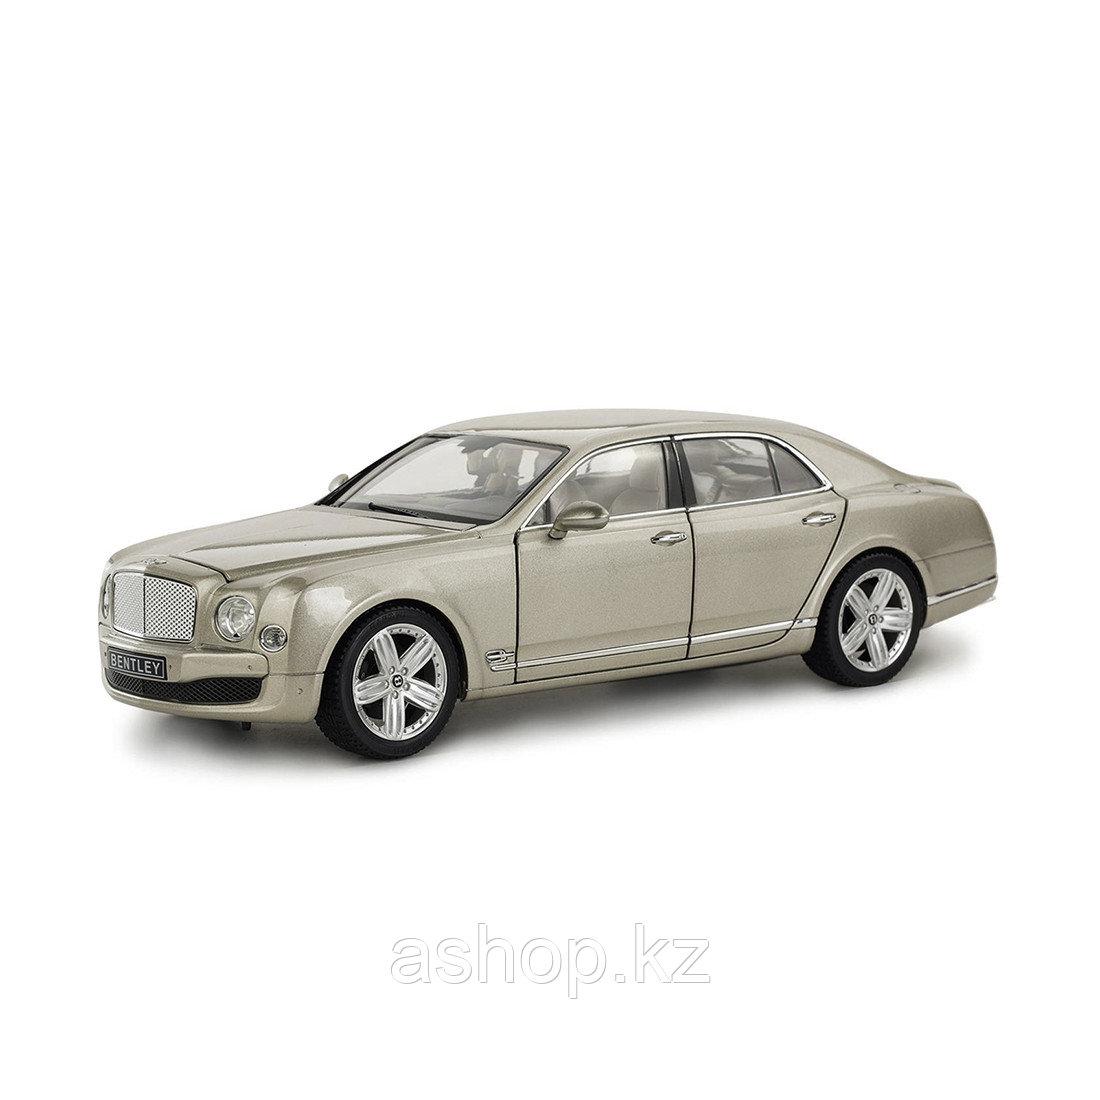 Модель автомобиля коллекционная Rastar Bentley Mulsanne, 1:18, Материал: Металл, Цвет: Бежевый, (43800Ch)